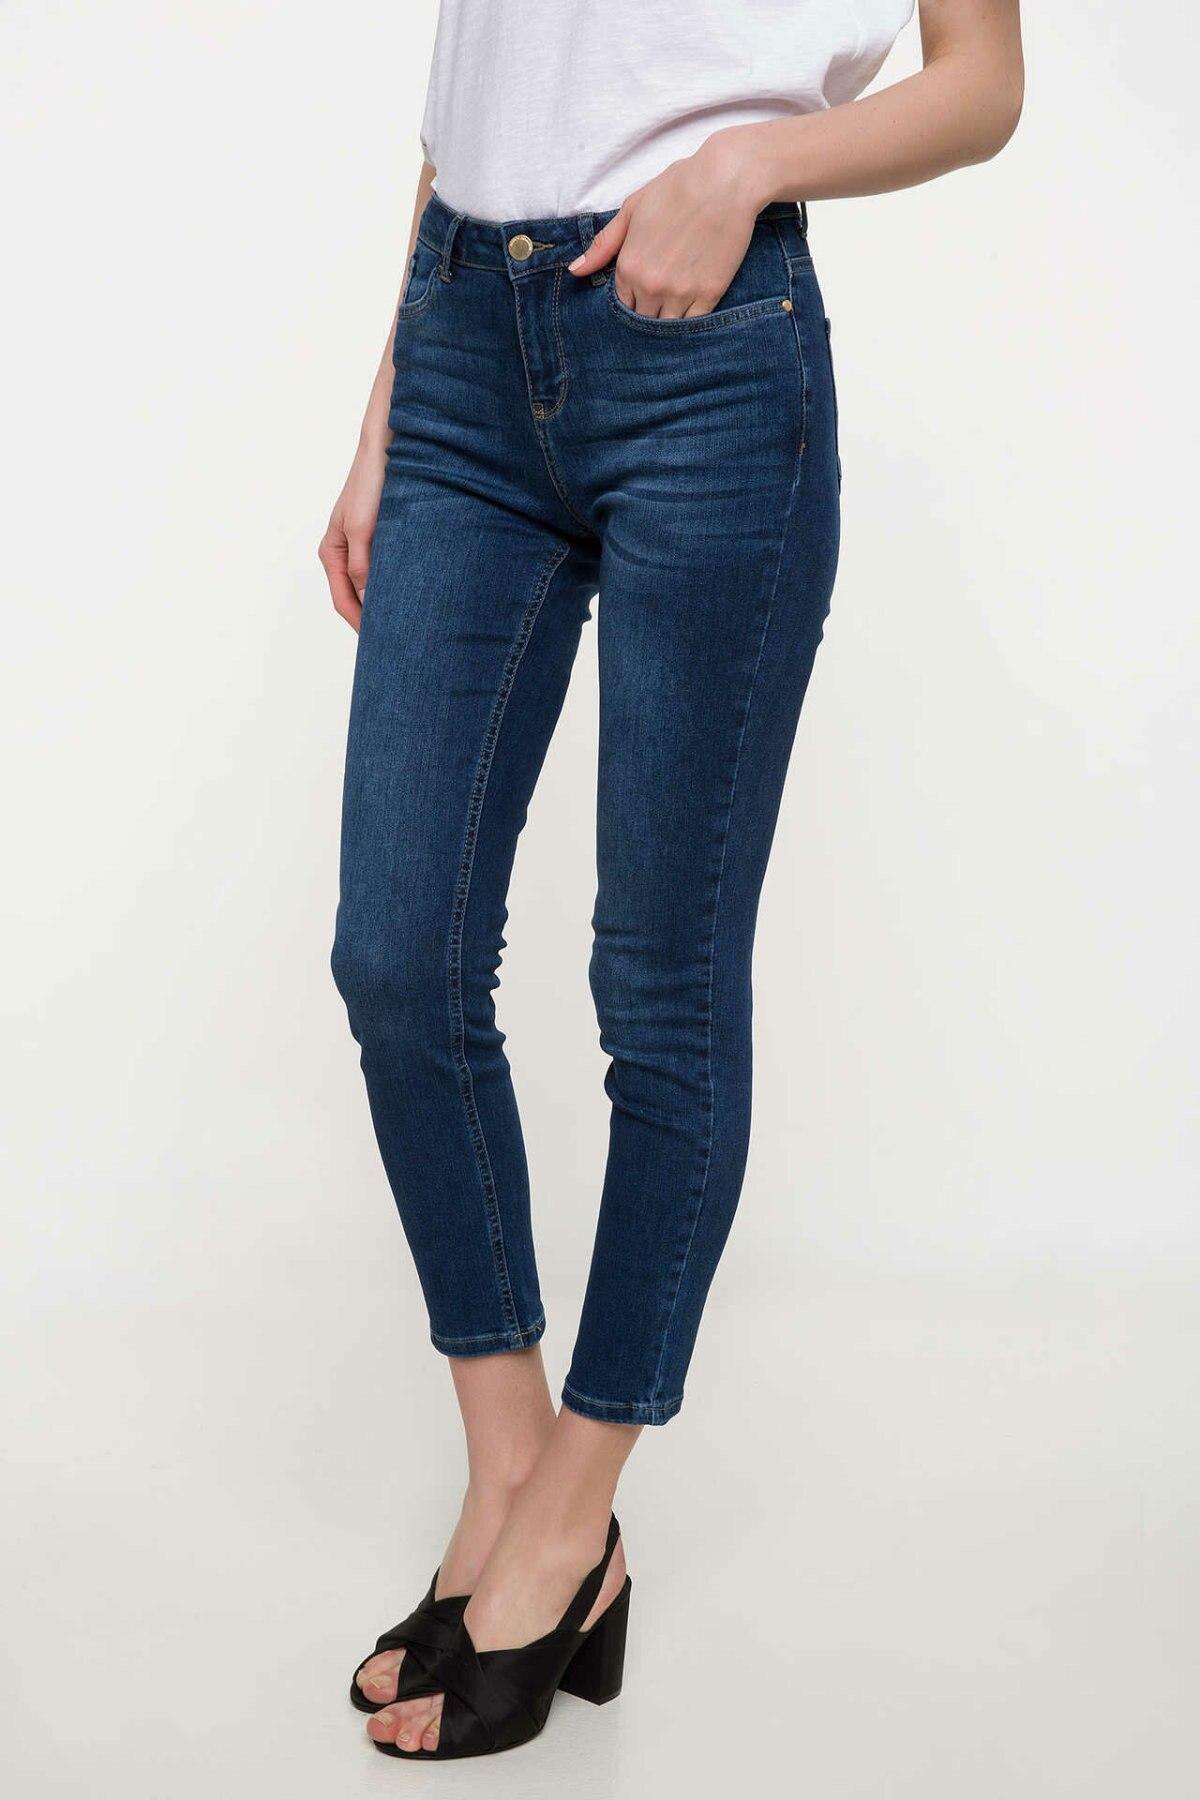 DeFacto Women Summer Skinny Denim Jeans Women Casual Ninth Denim Pants Female Slim Blue Denim Trousers-I7670AZ18SM